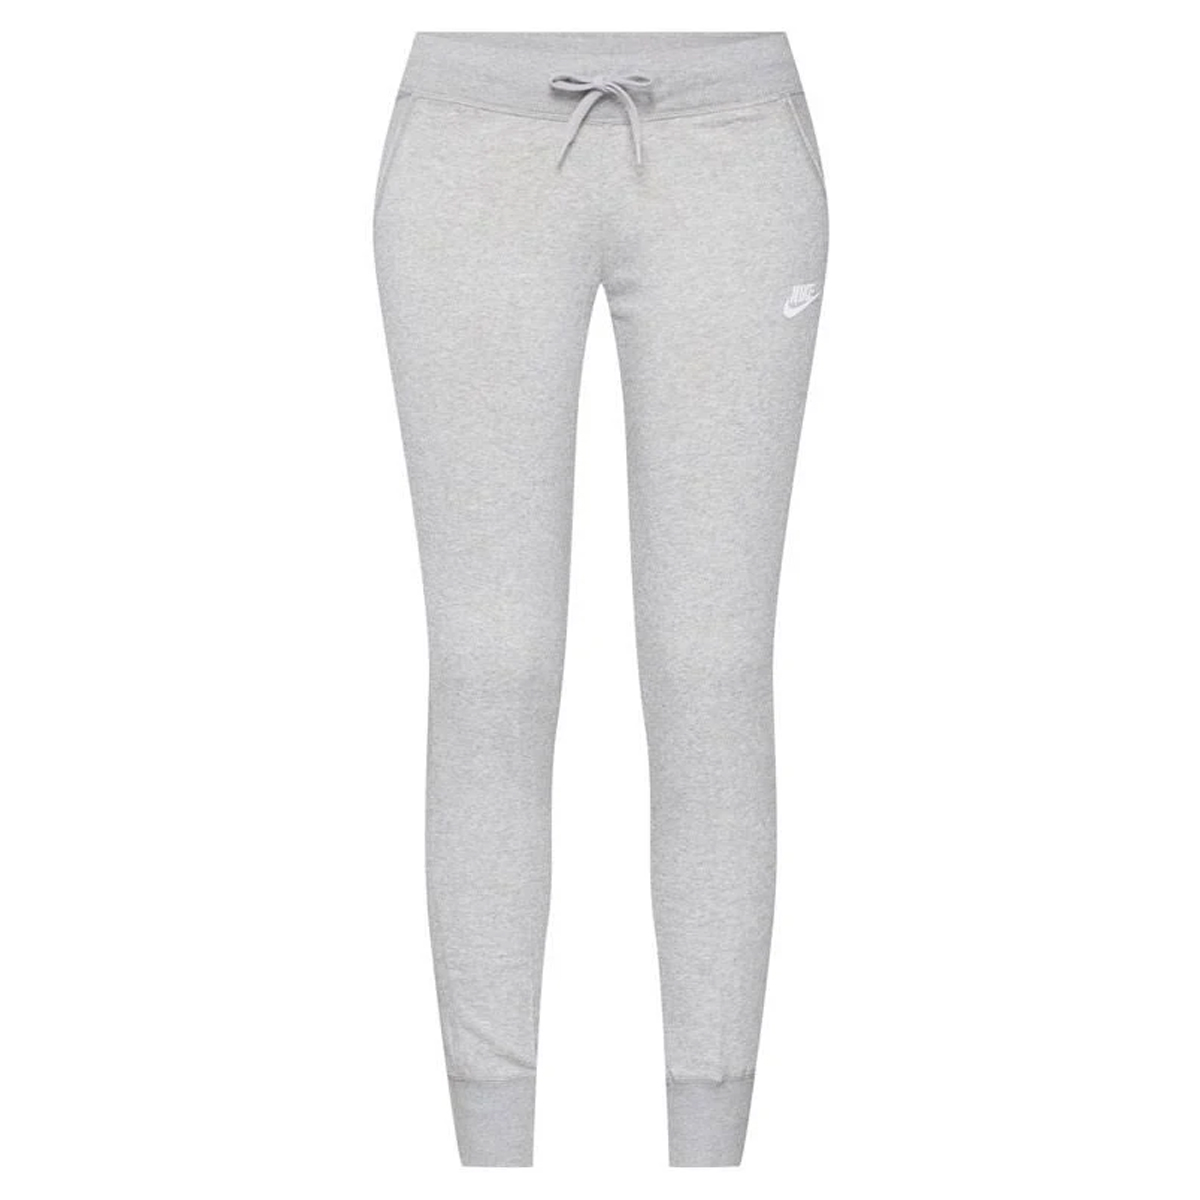 6c12d3bc911 Nike Fleece Tight Dames Joggingbroek. 807364 063 Dark Grey Heather Matte  Silver